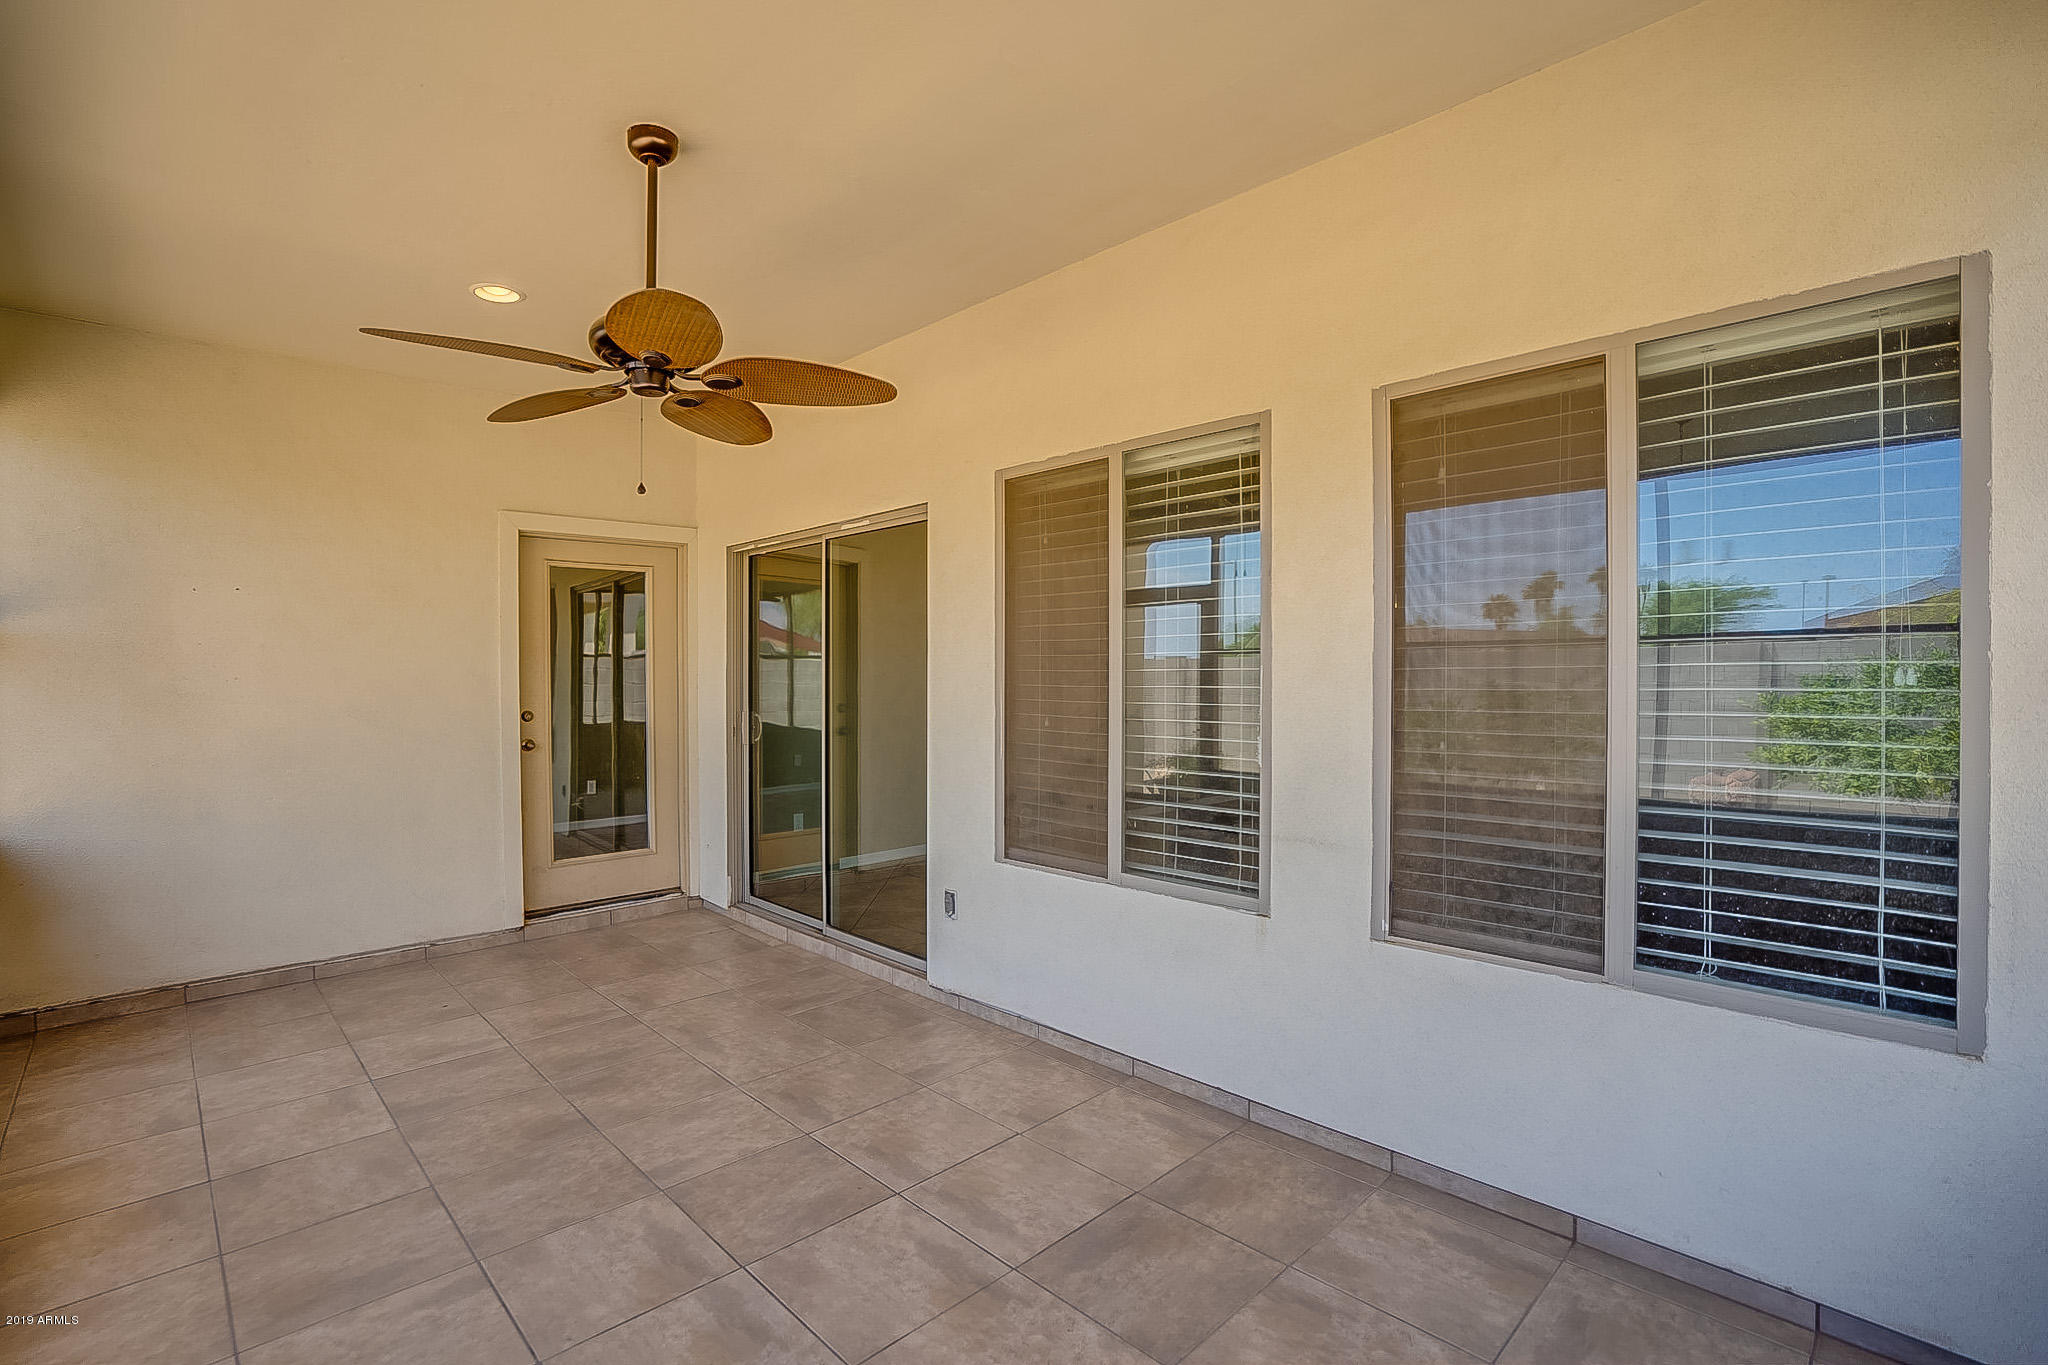 MLS 5939119 12222 W IRONWOOD Street, El Mirage, AZ 85335 El Mirage AZ Four Bedroom